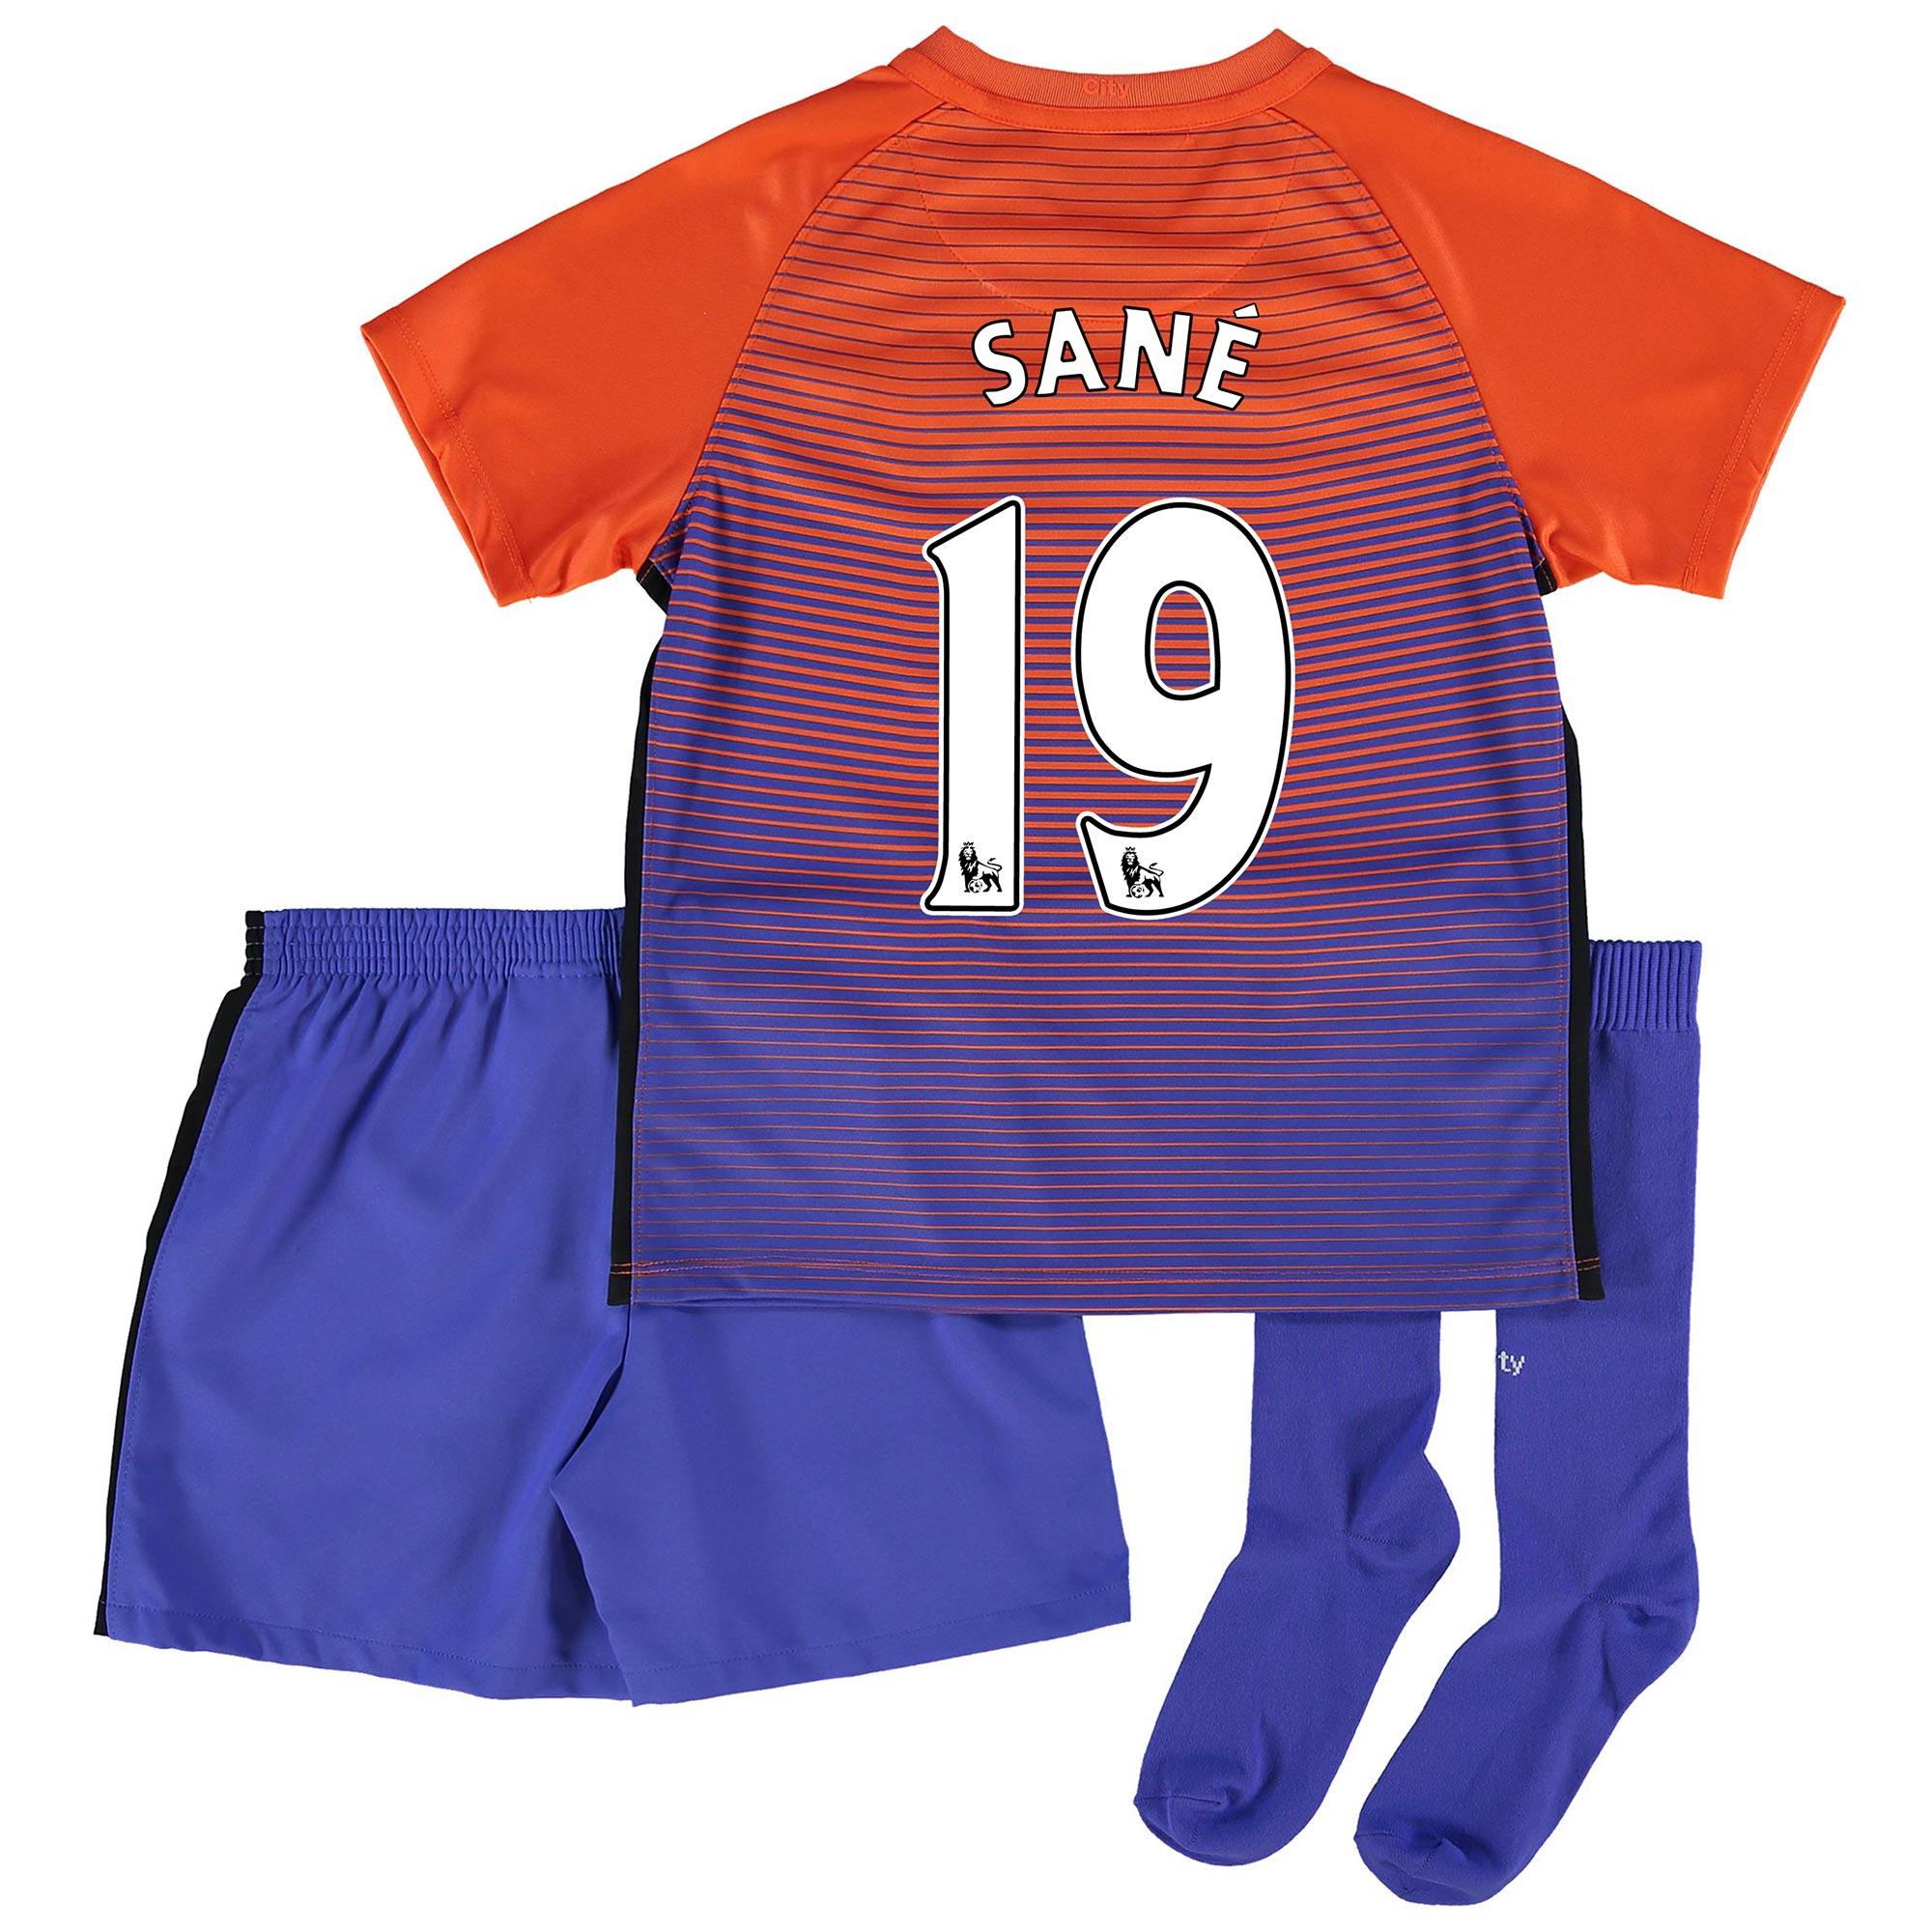 Manchester City Third Stadium Kit 2016-17 - Little Kids with San?® 19 p